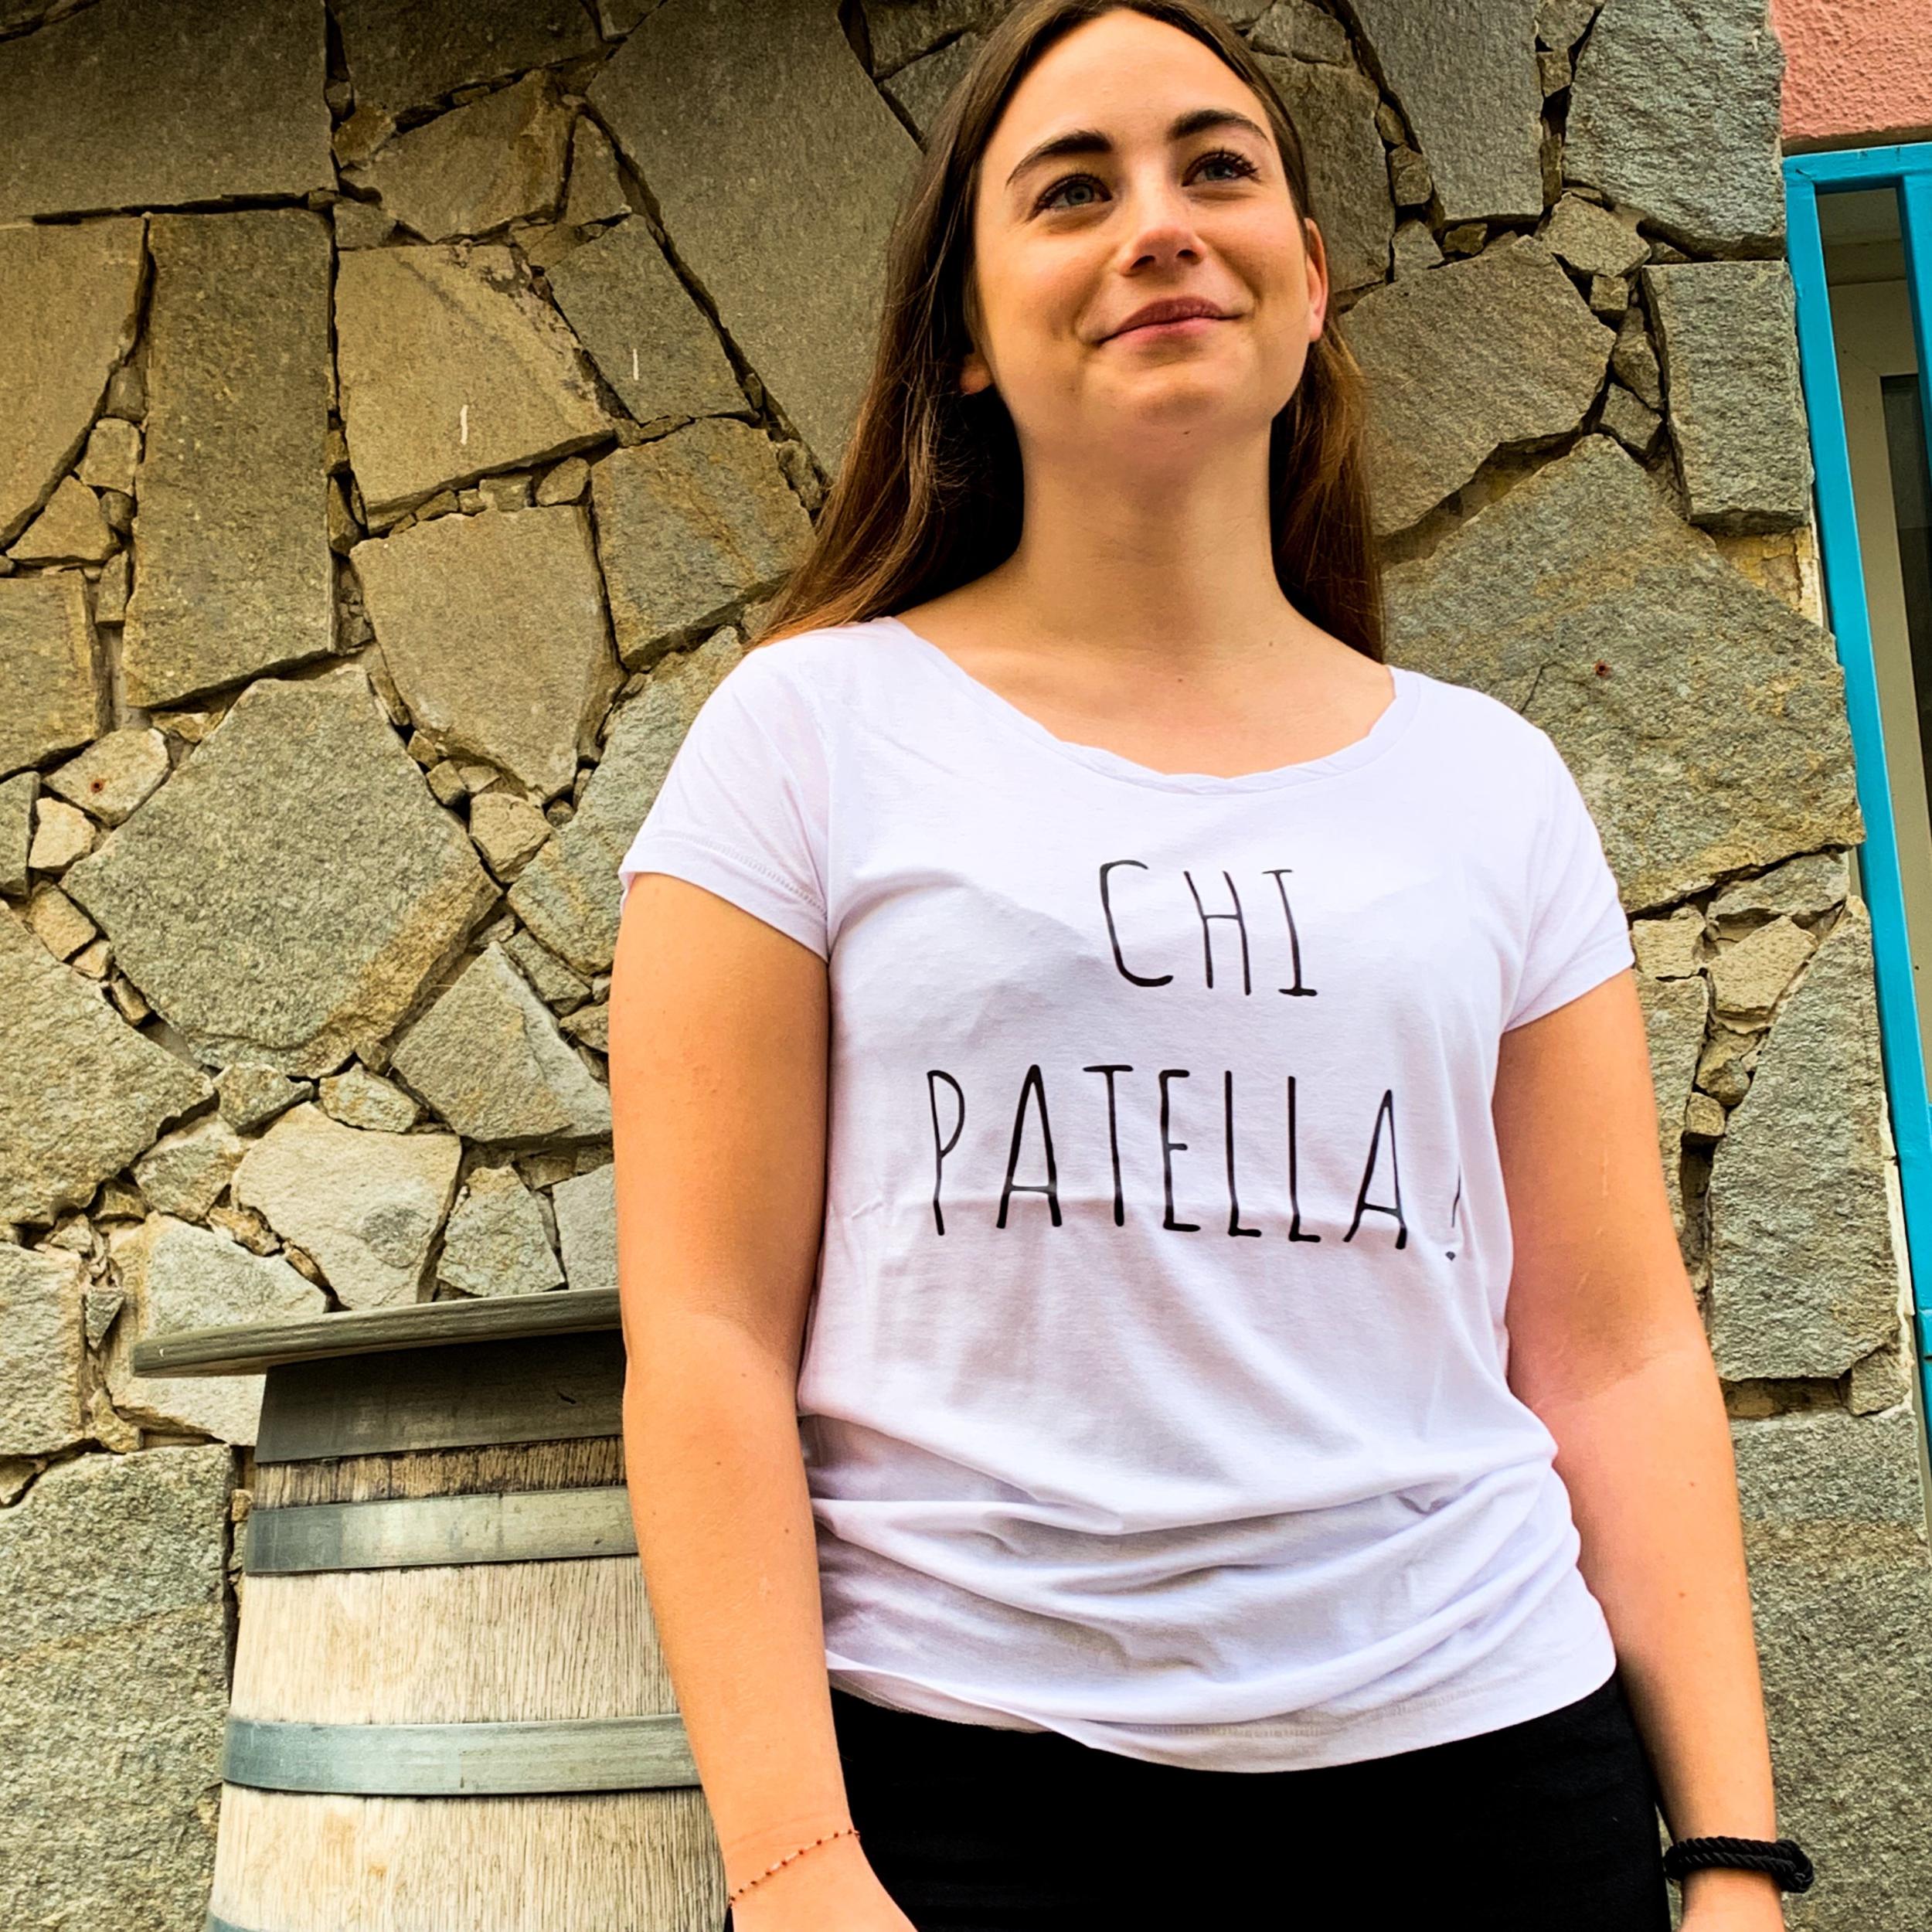 CHI PATELLA !